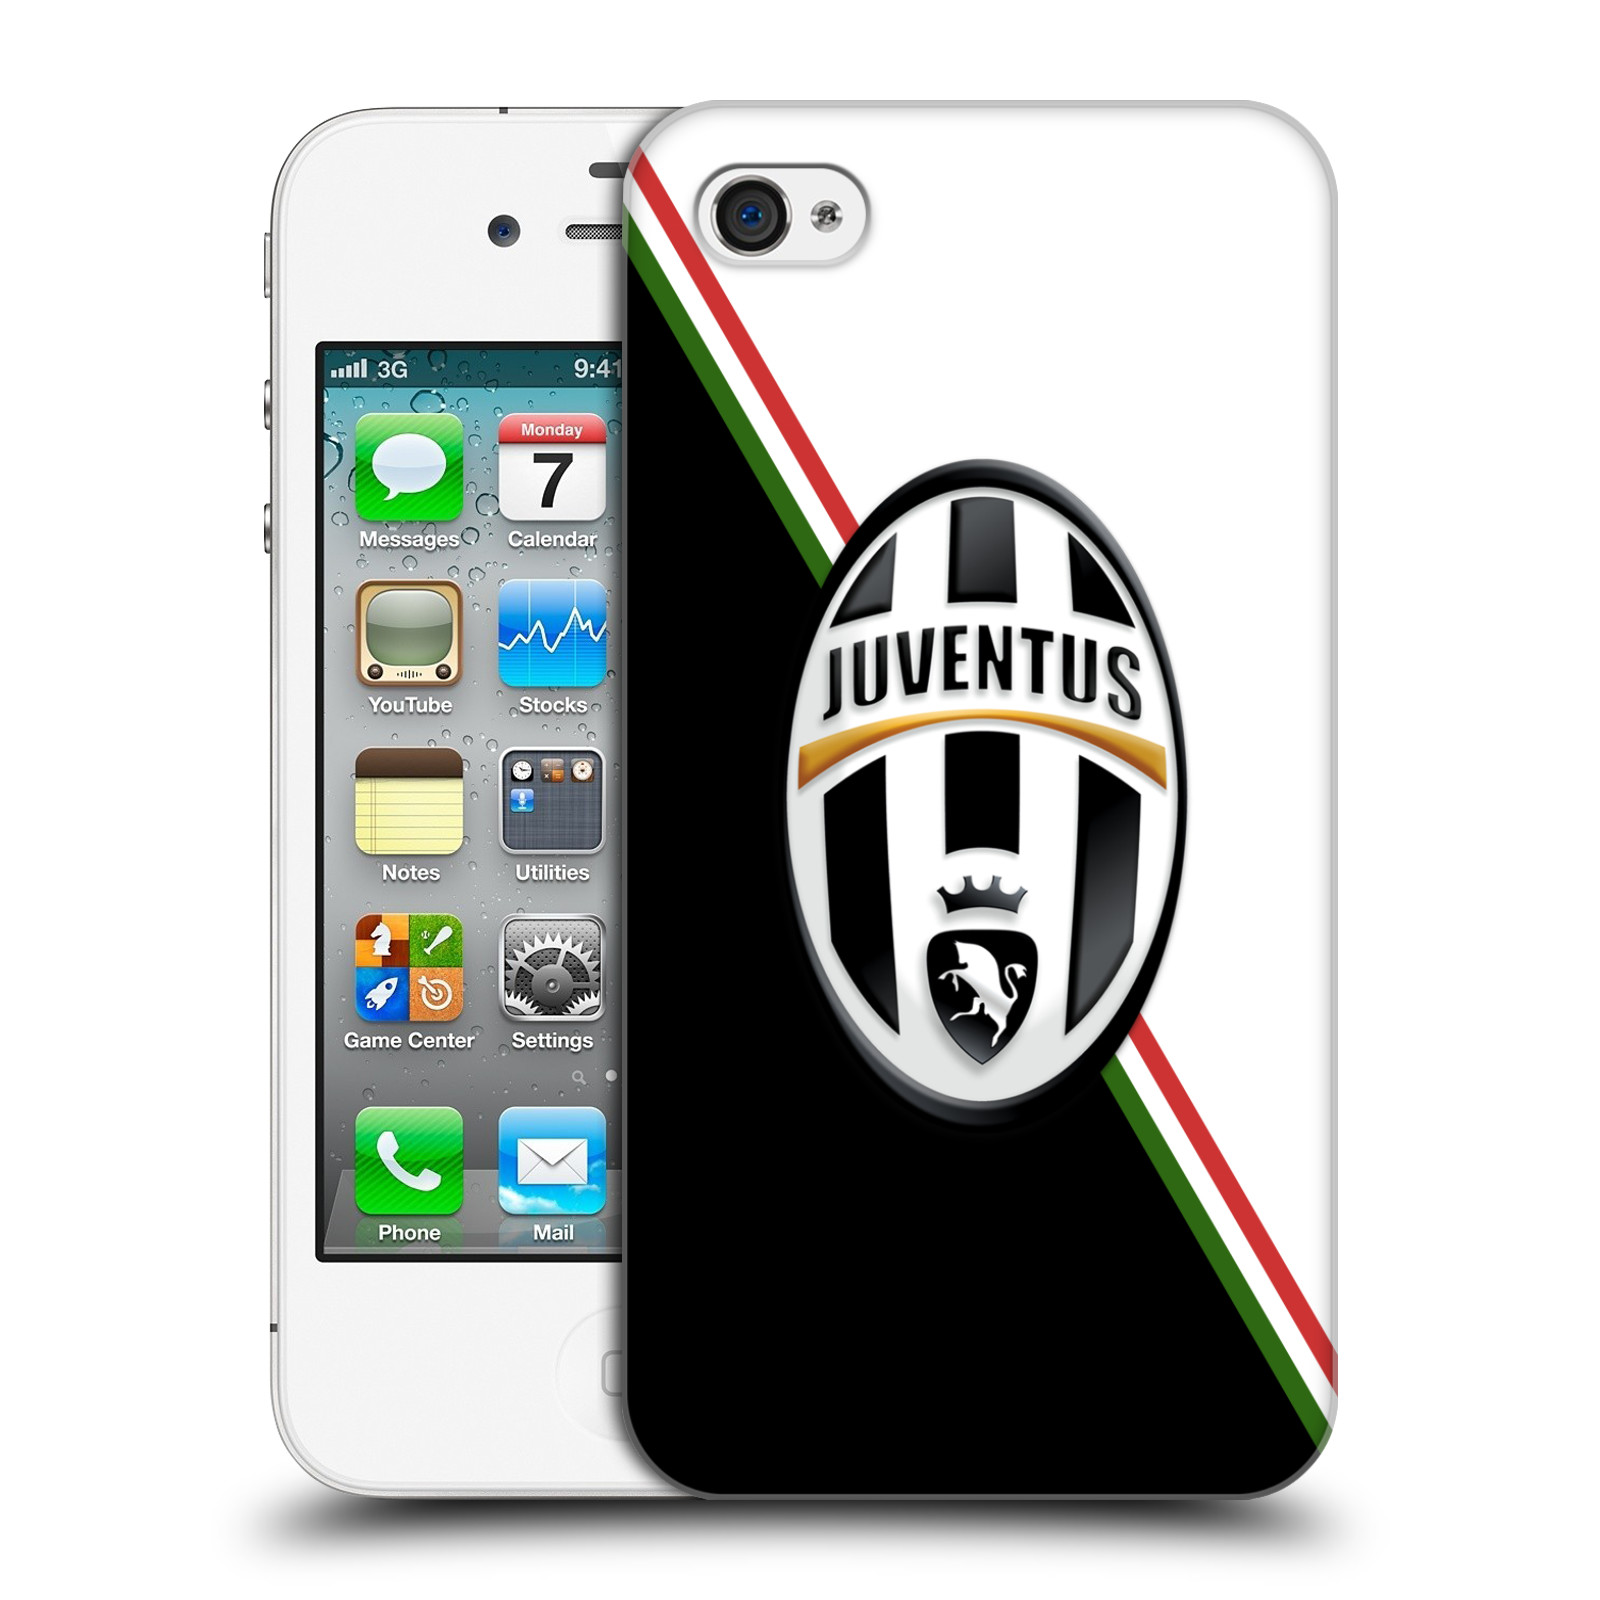 Plastové pouzdro na mobil Apple iPhone 4 a 4S HEAD CASE Juventus FC - Black and White (Plastový kryt či obal na mobilní telefon Juventus FC Official pro Apple iPhone 4 a 4S)